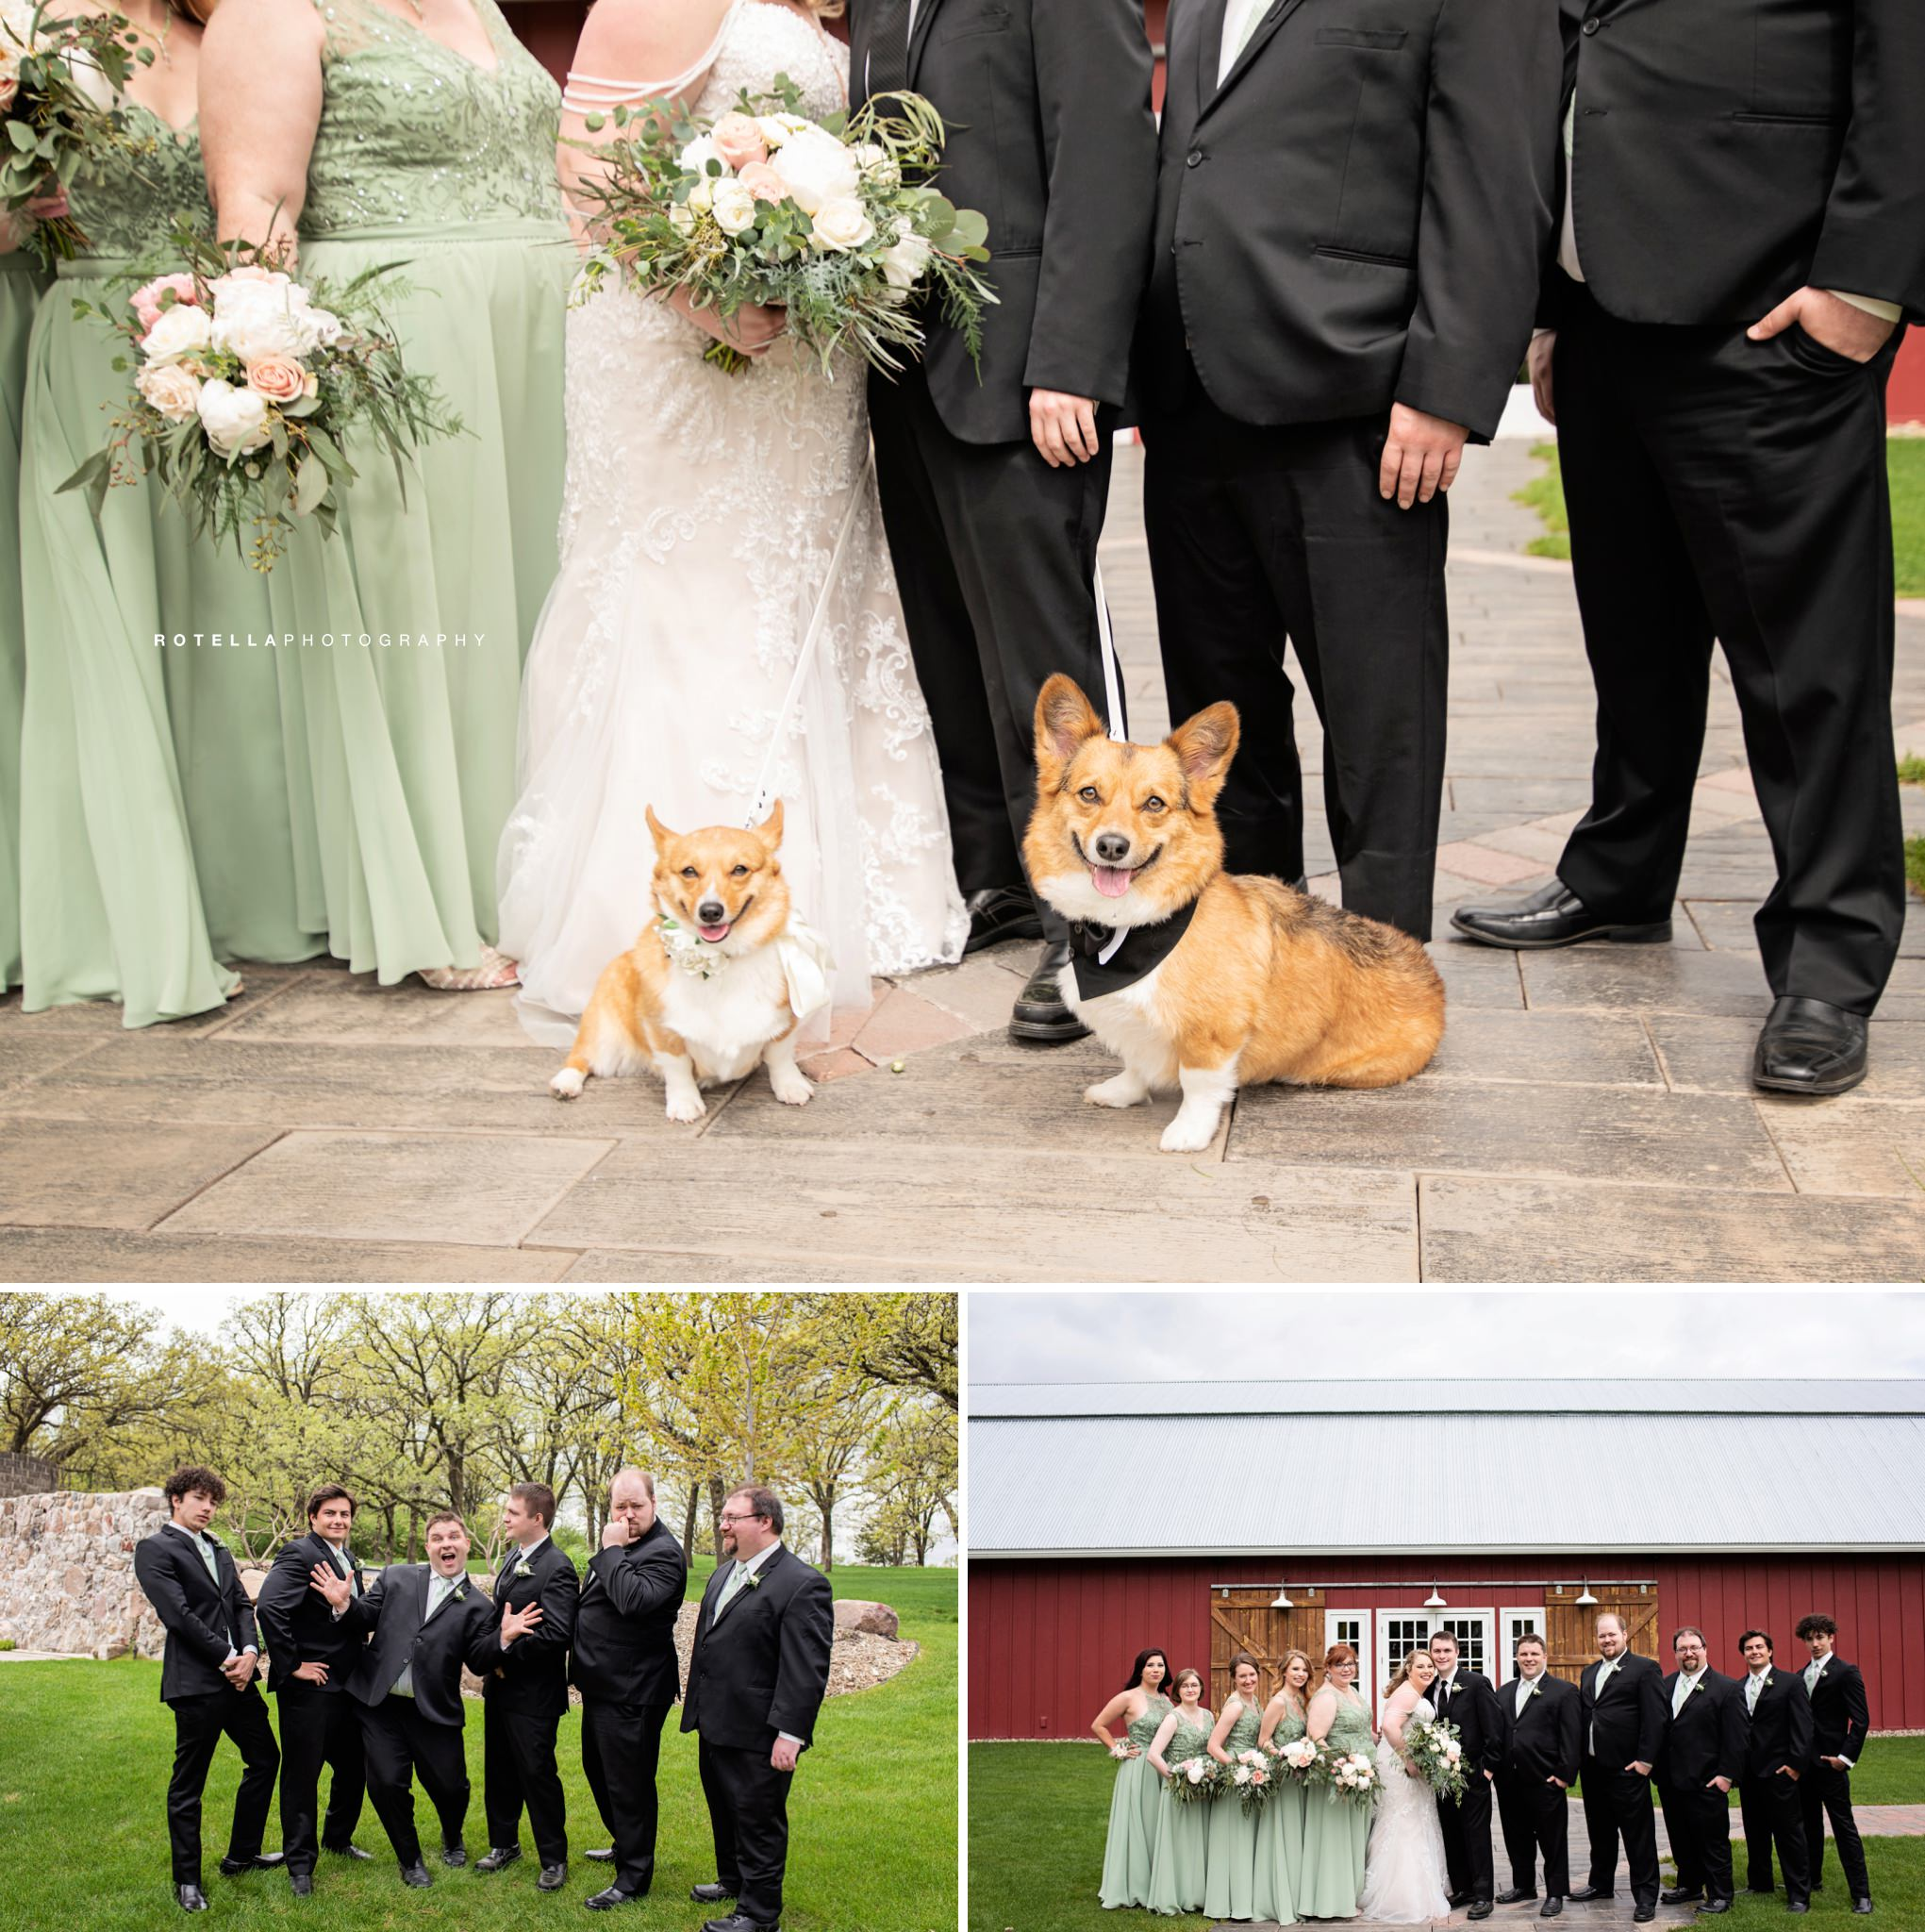 Cassie-Corbin-Wedding-05-25-2019-Rotella-Photography-PREV-97-467_BLOG.jpg